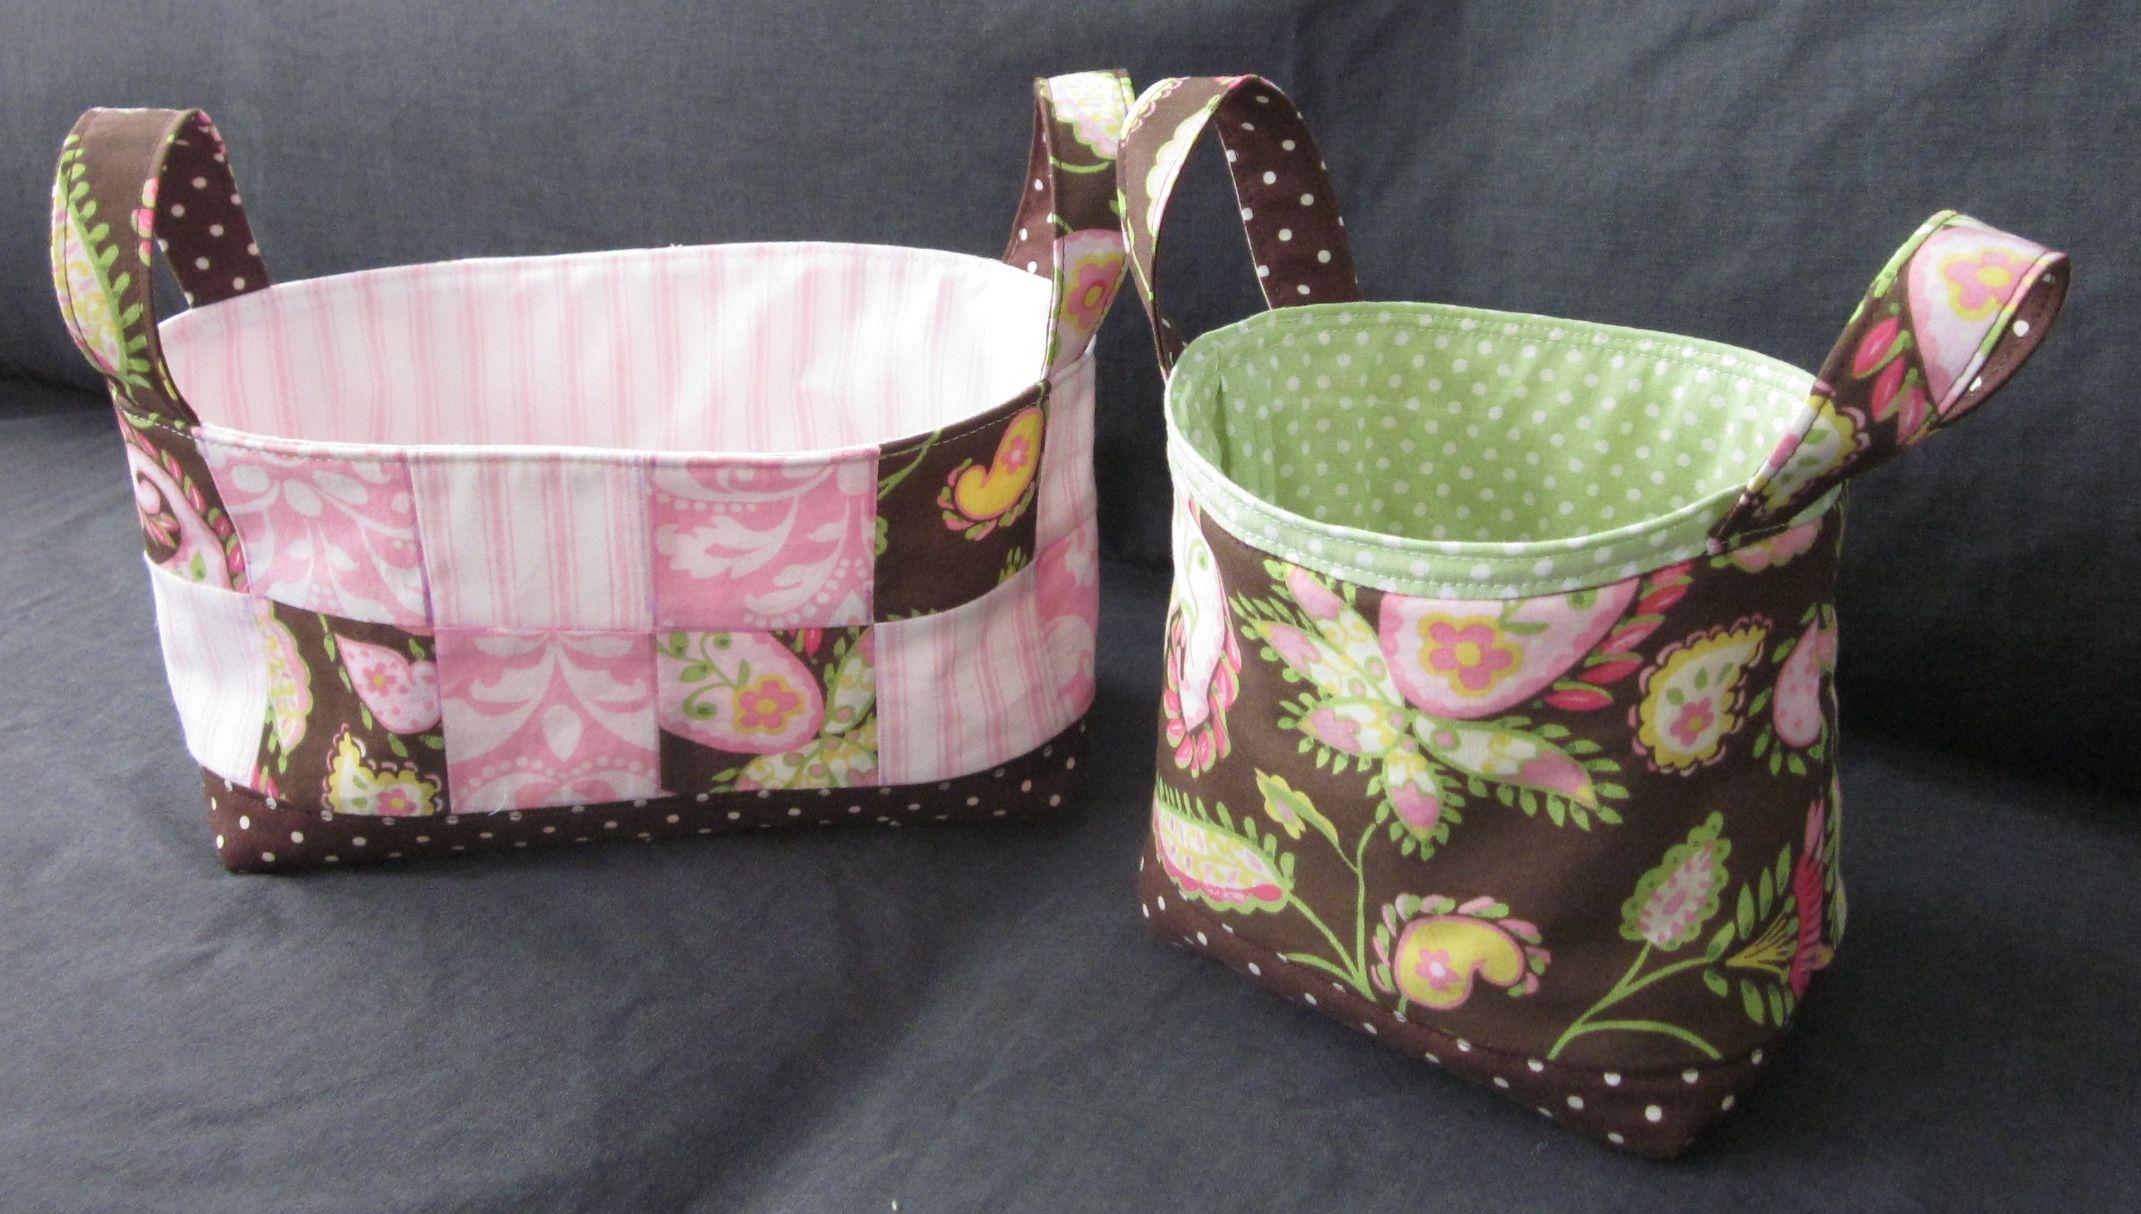 Fabric baskets.